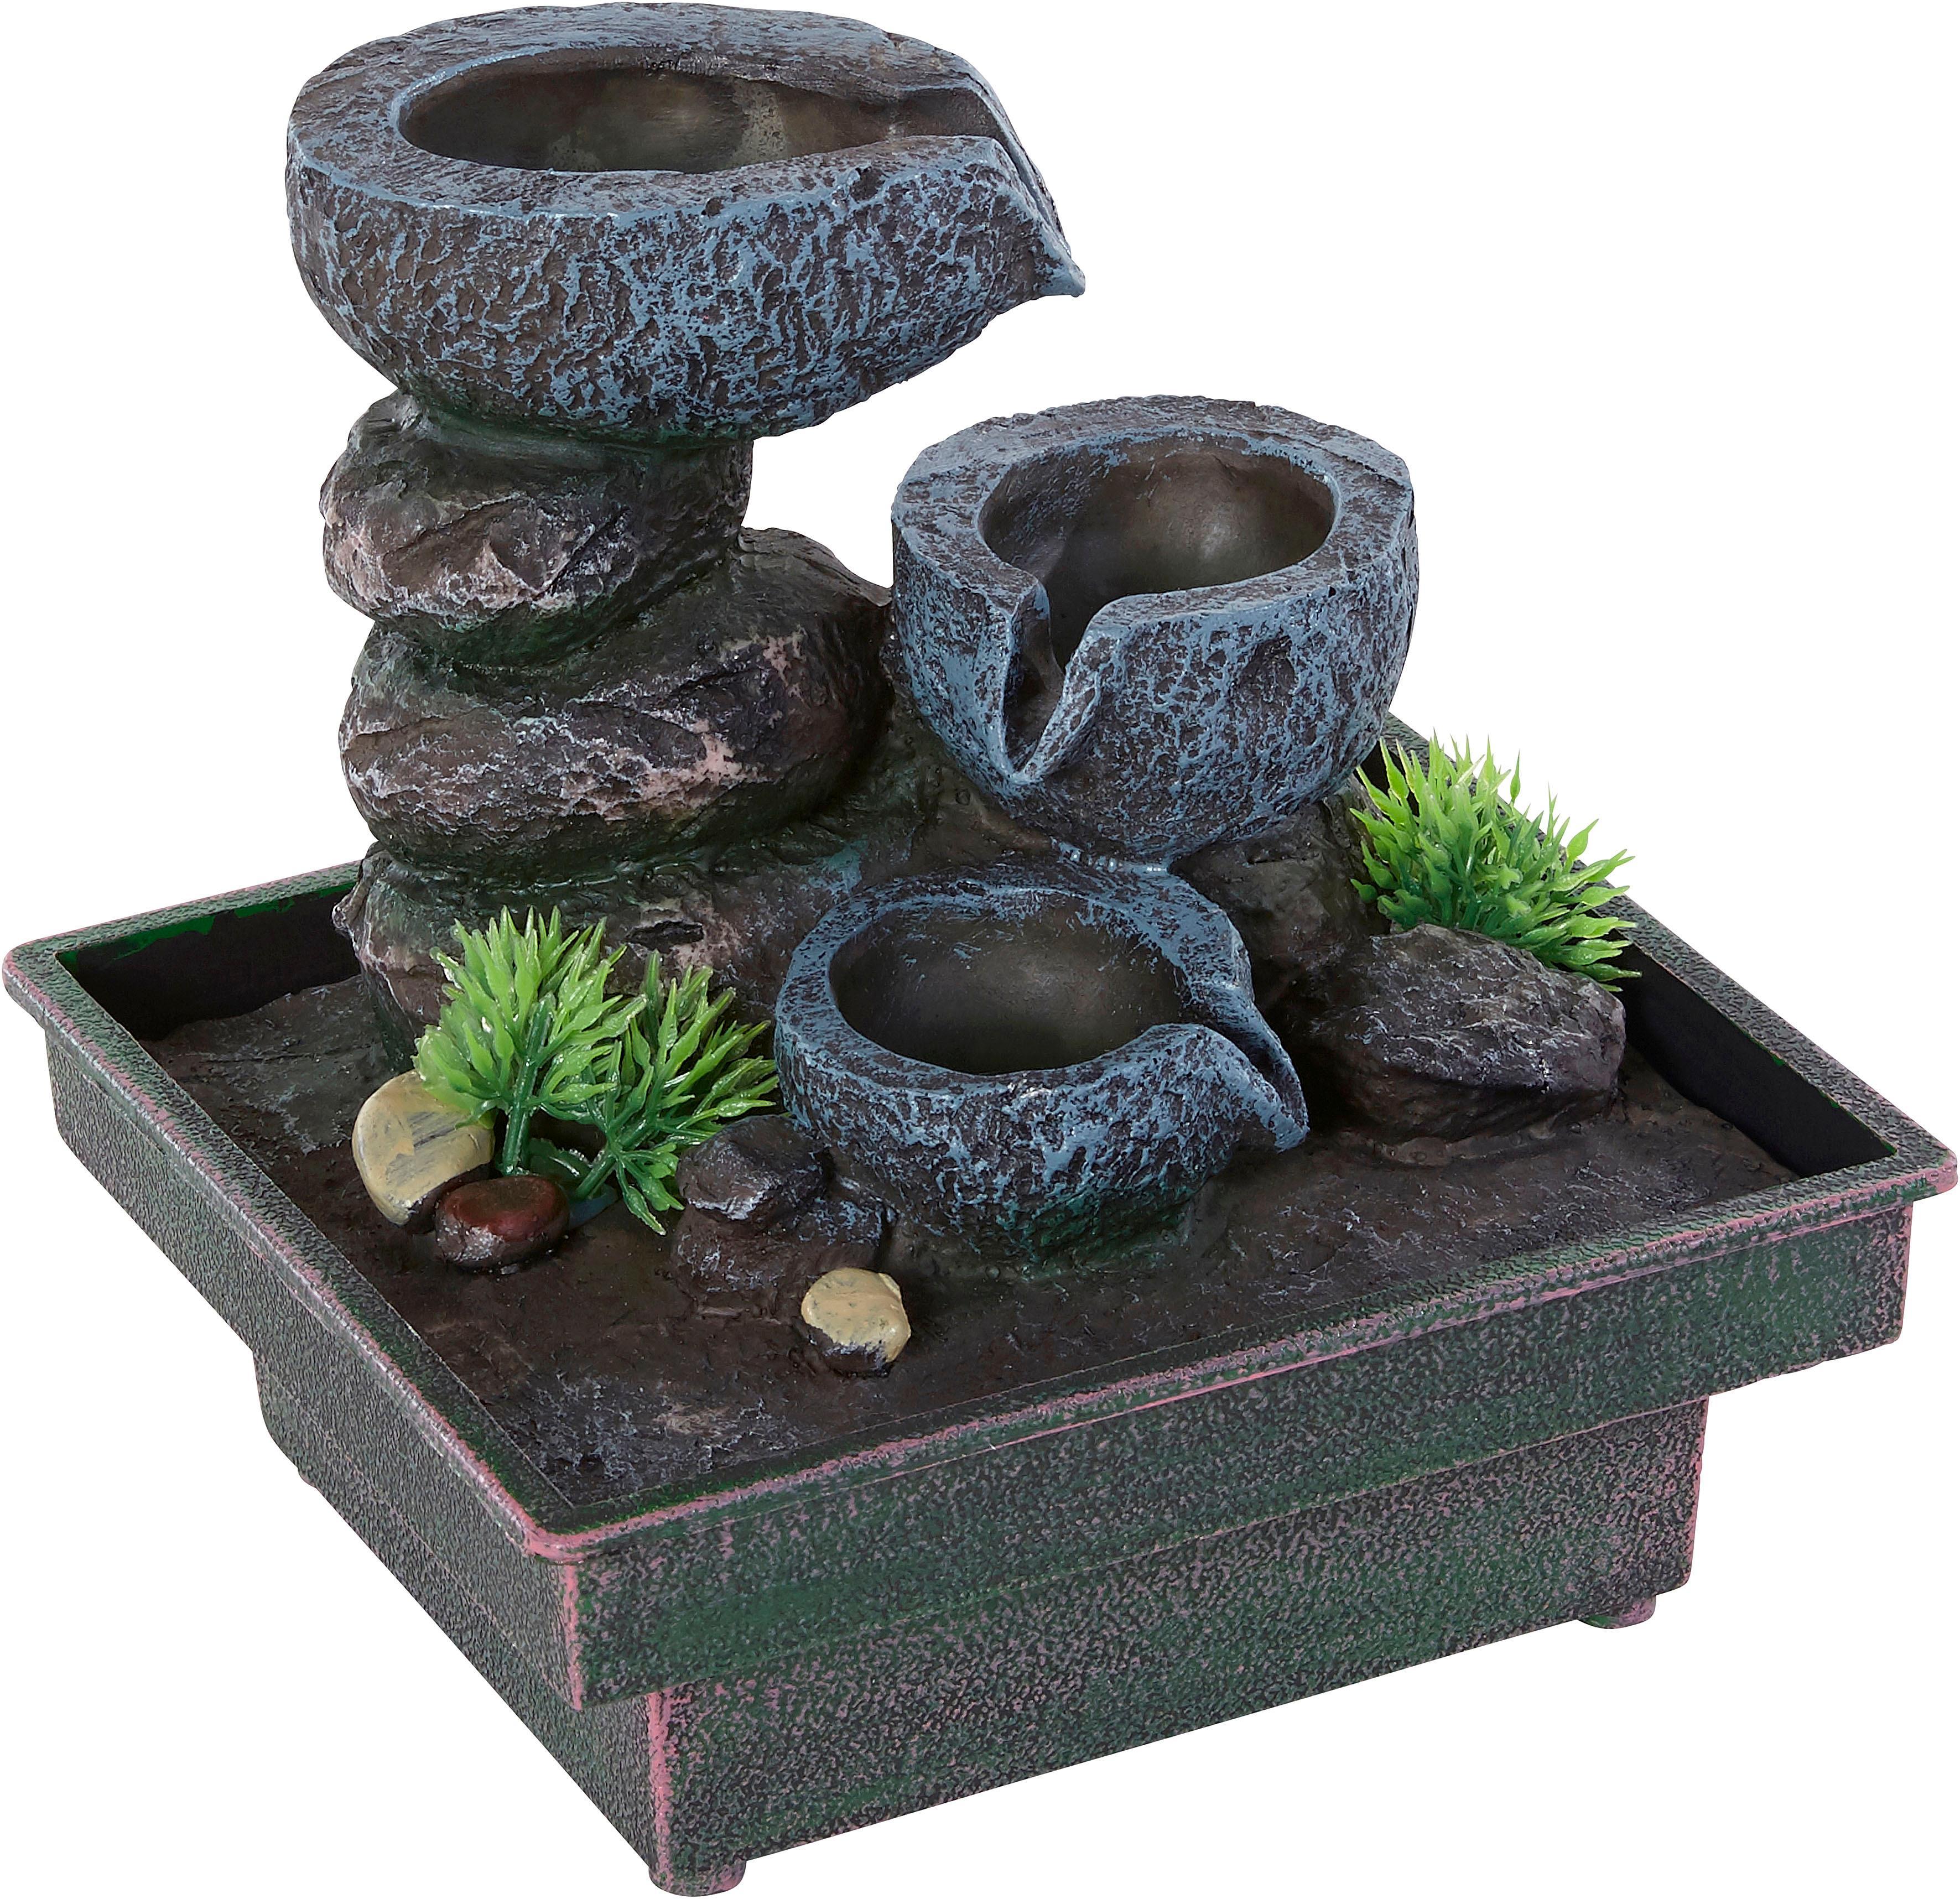 Home affaire Zimmerbrunnen »Floating Stones« | Dekoration > Zimmerbrunnen | home affaire